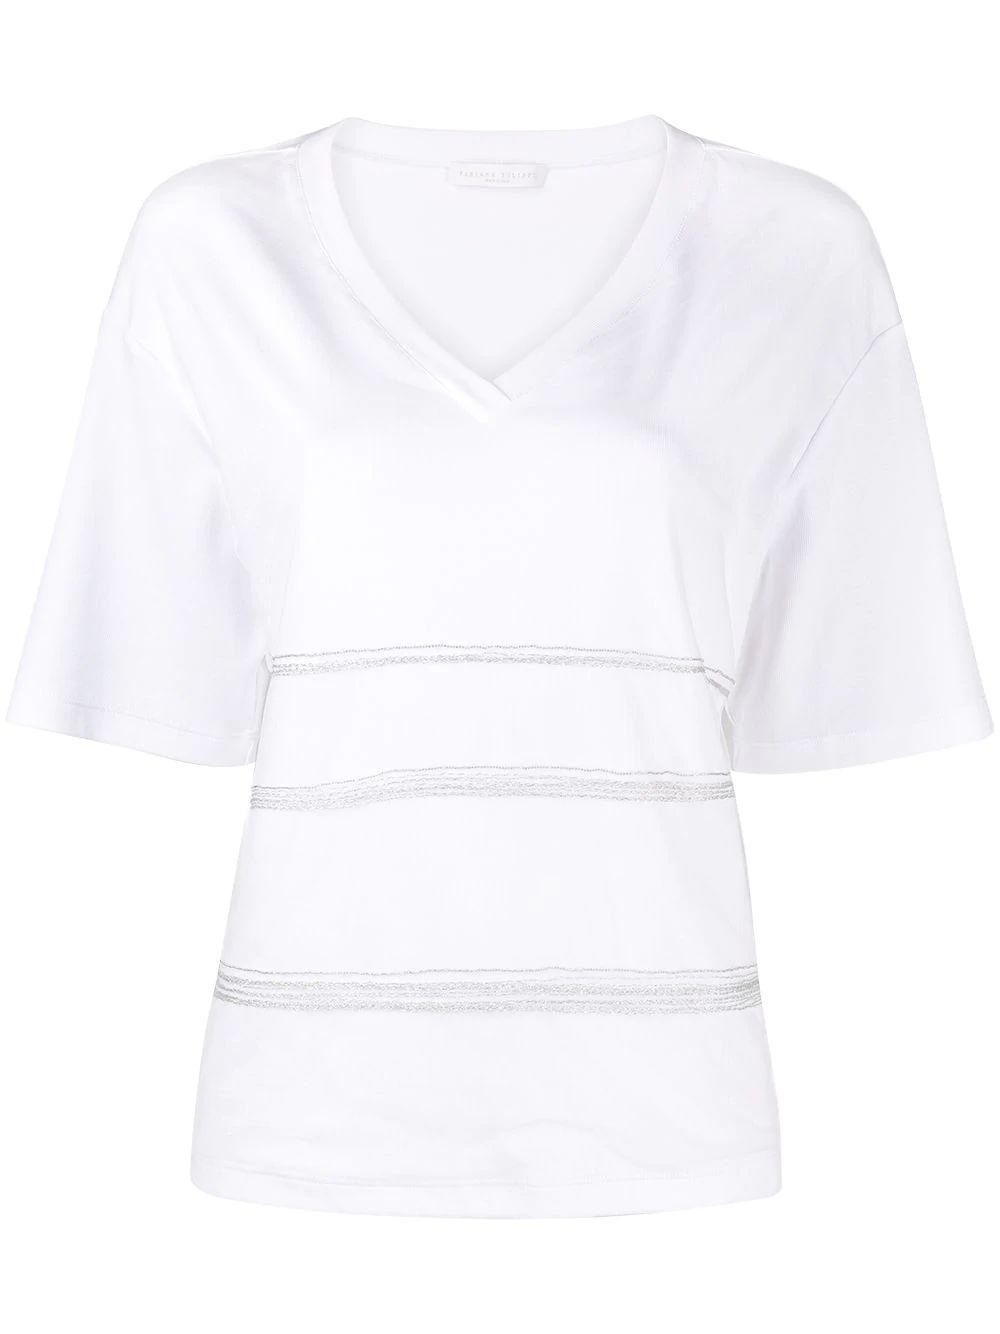 Beaded Detail T- Shirt Item # JED271W135